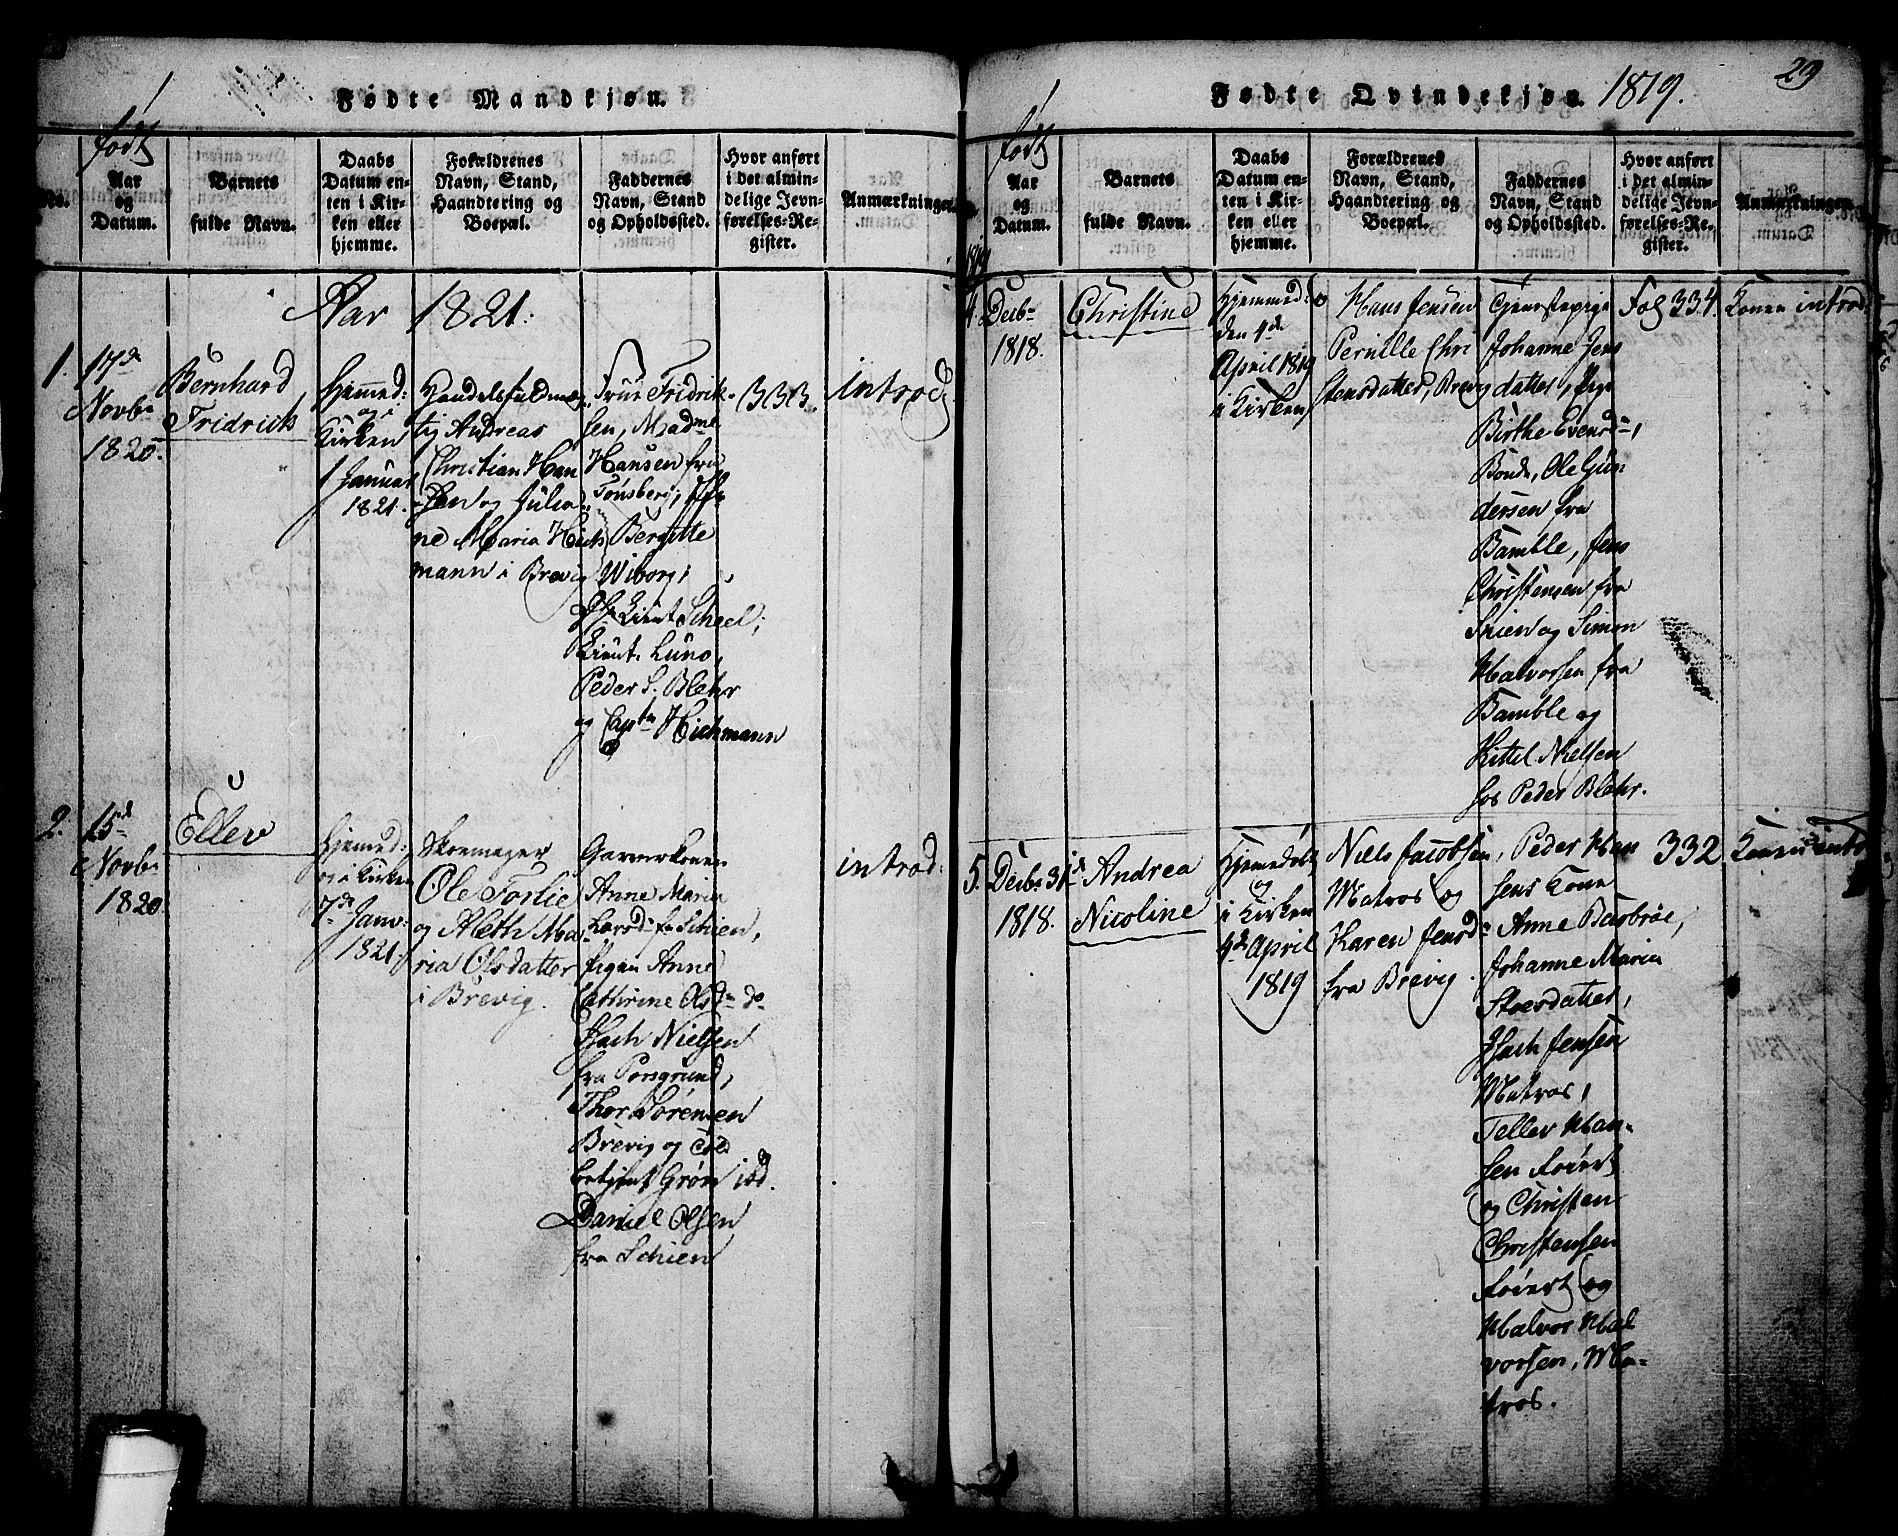 SAKO, Brevik kirkebøker, G/Ga/L0001: Klokkerbok nr. 1, 1814-1845, s. 29